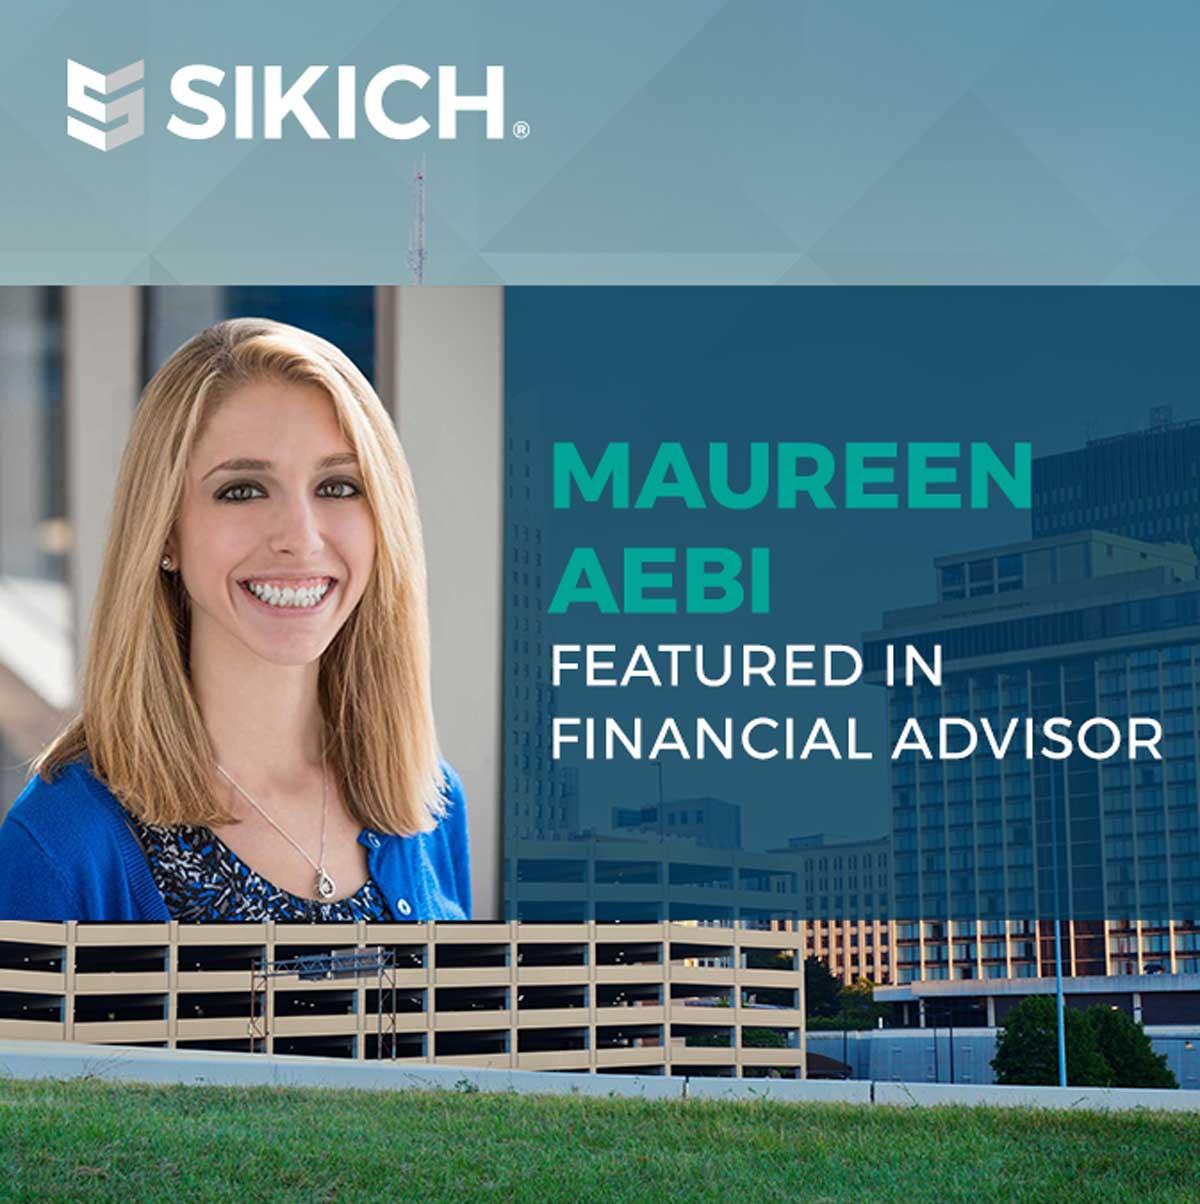 Maureen Aebi featured in Financial Advisor